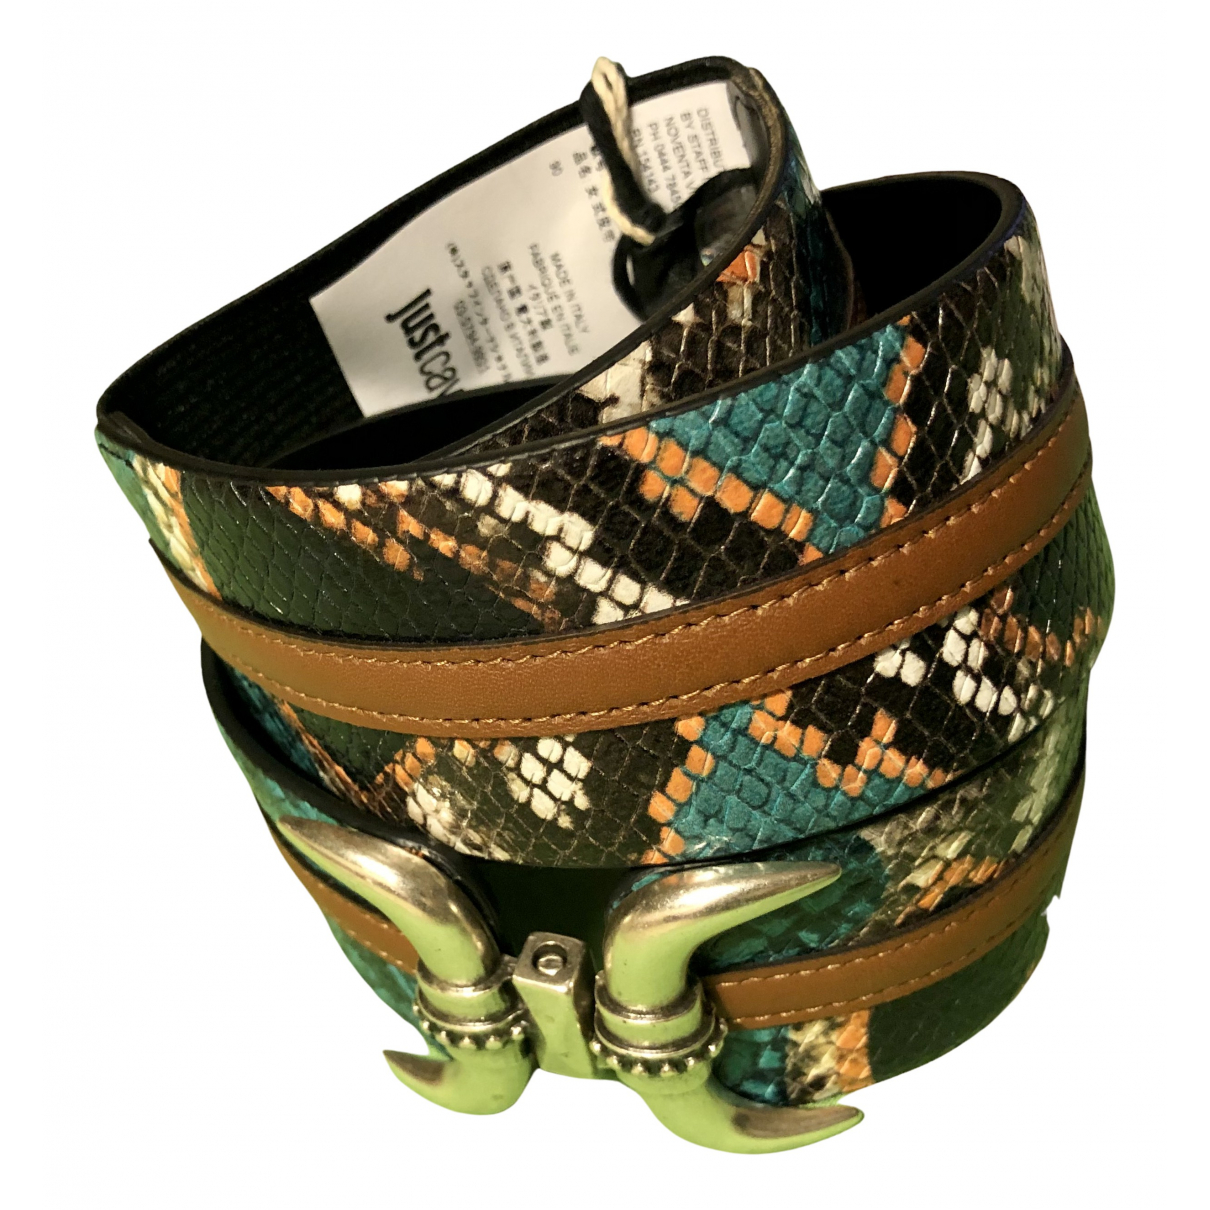 Just Cavalli N Leather belt for Women 90 cm